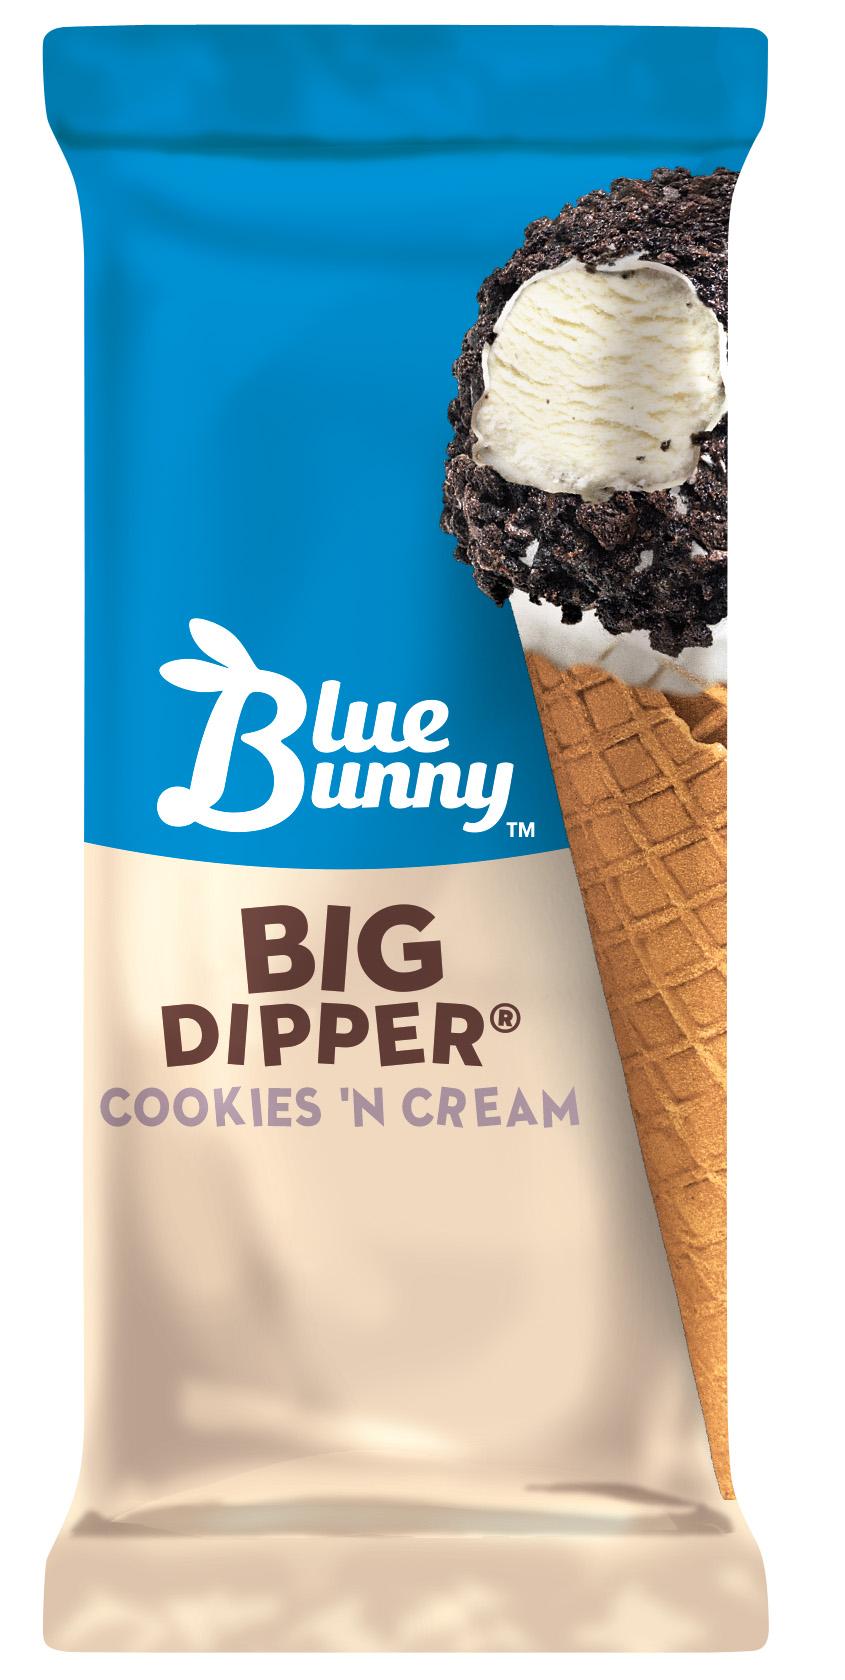 Big Dipper Cookies N' Creme 4.3oz